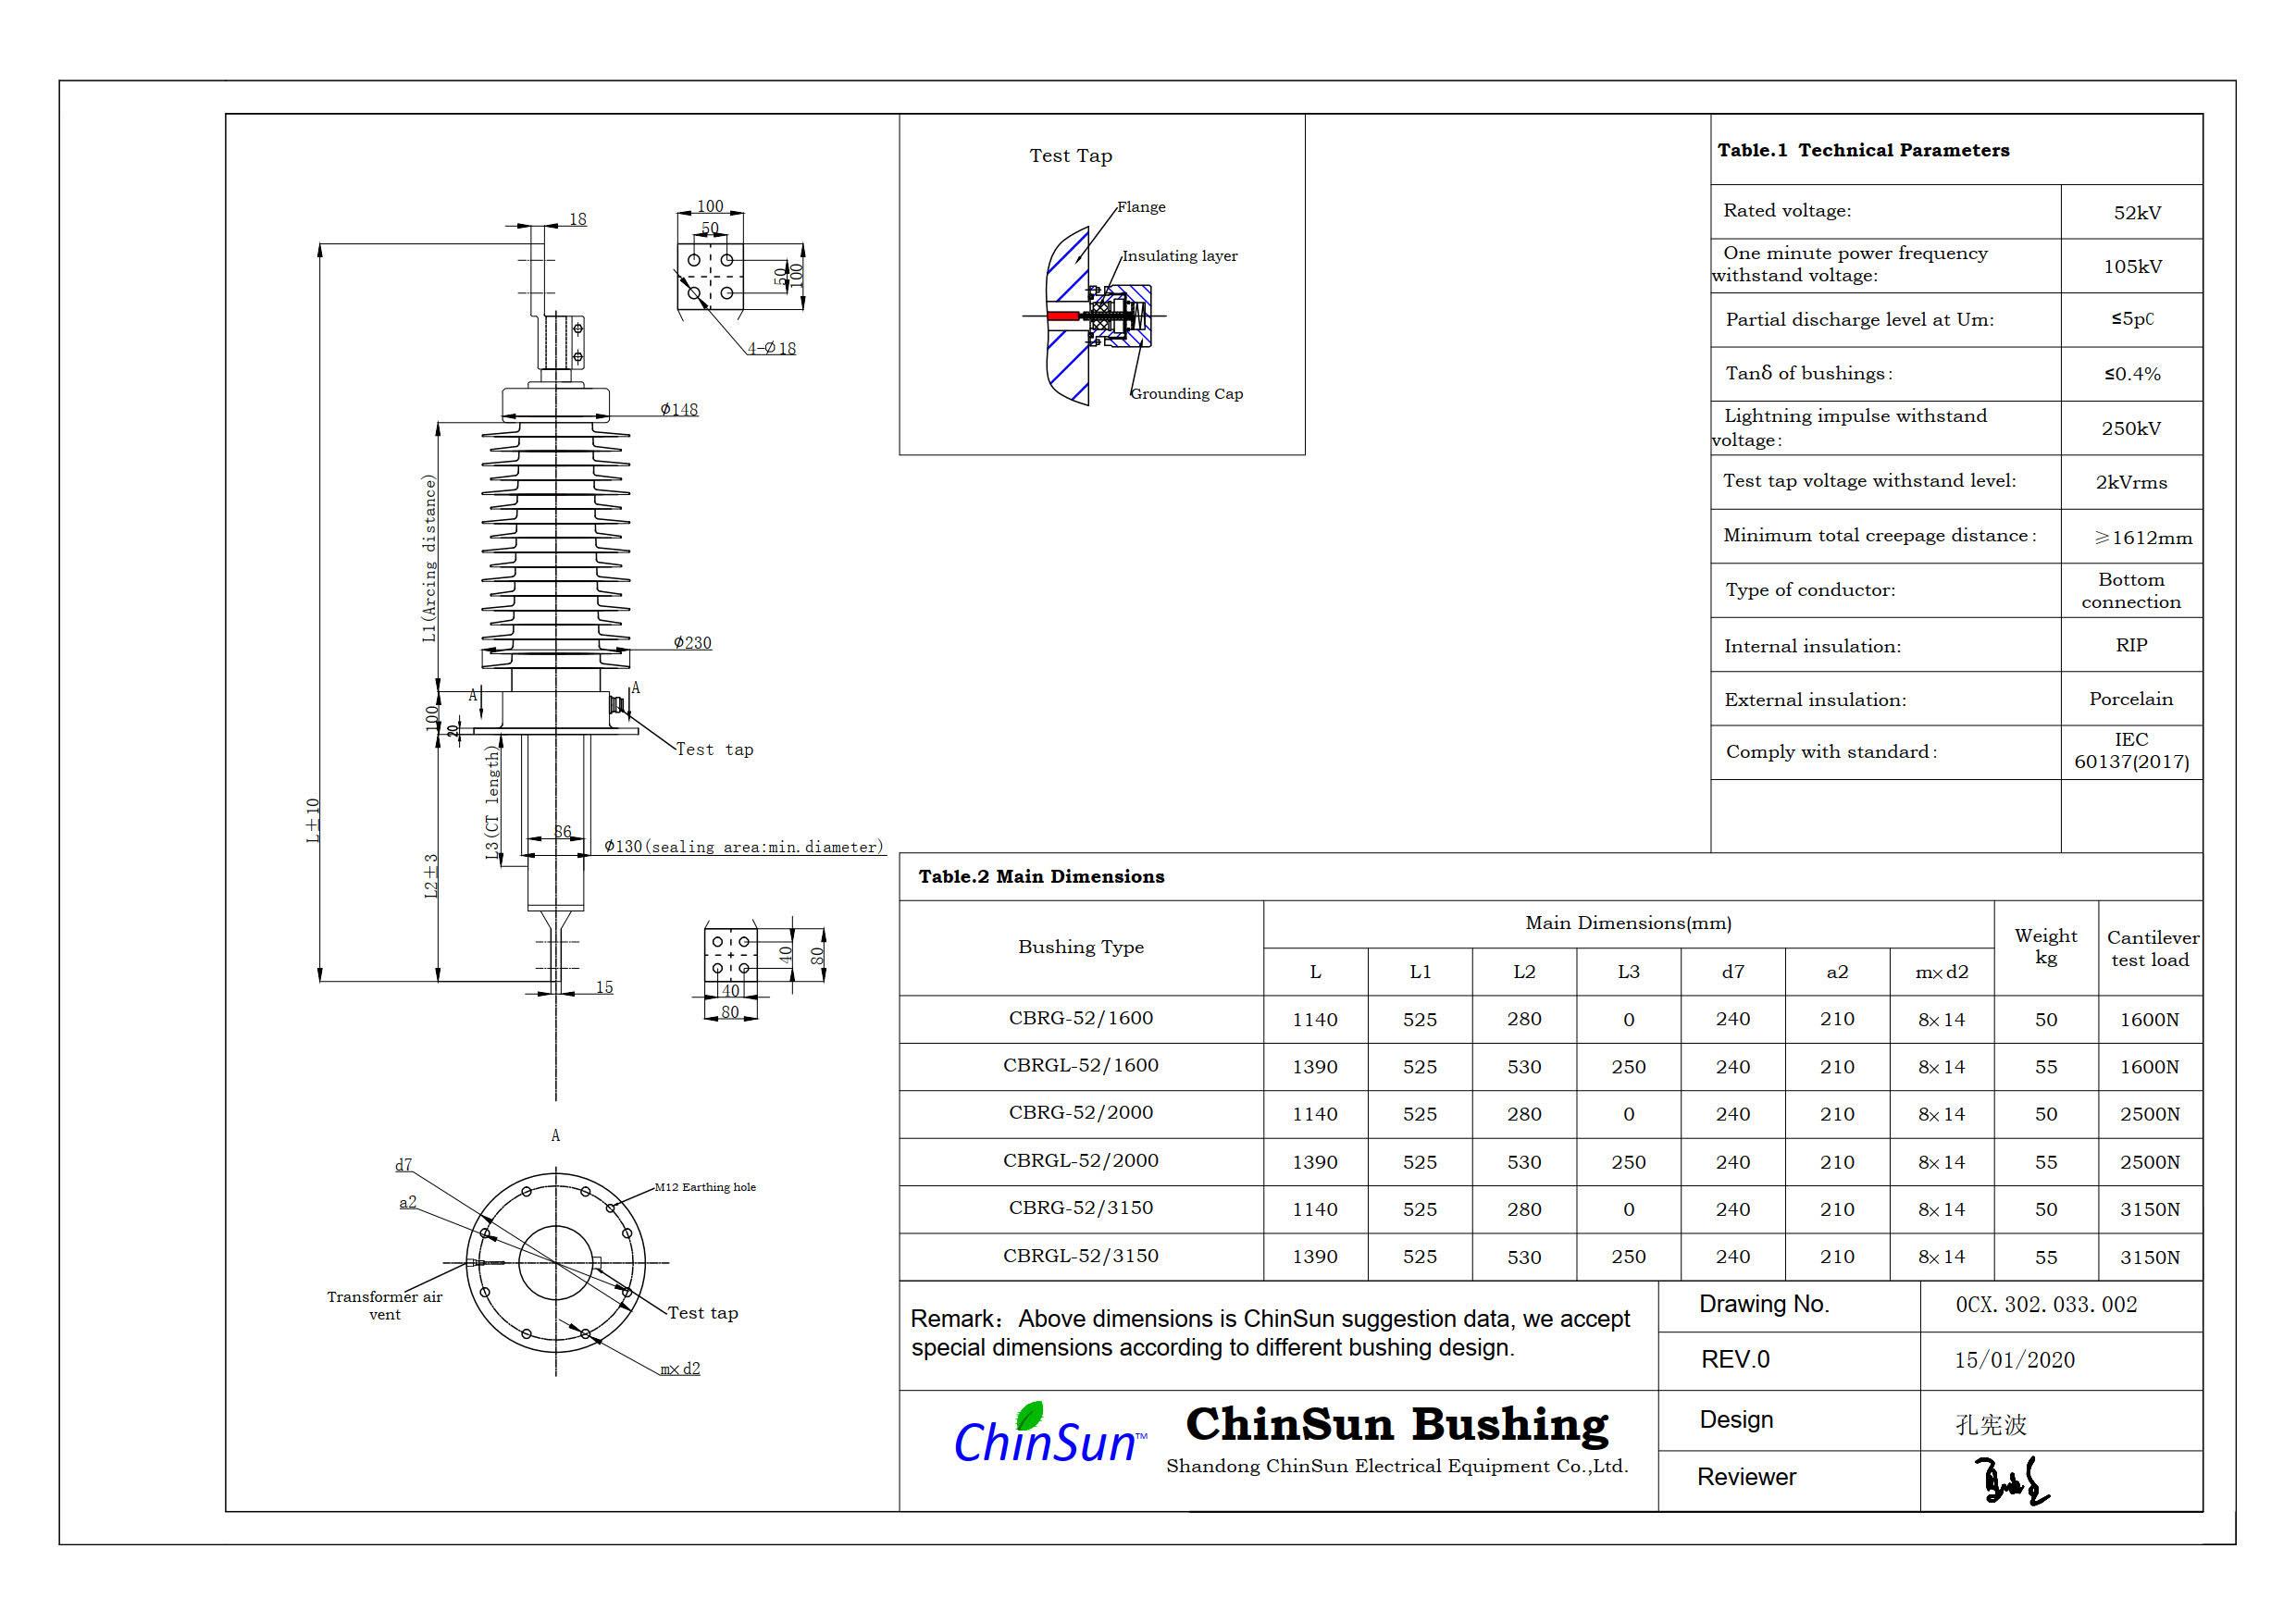 Drawing-transformer bushing-52kV_Porcelain-BC-ChinSun